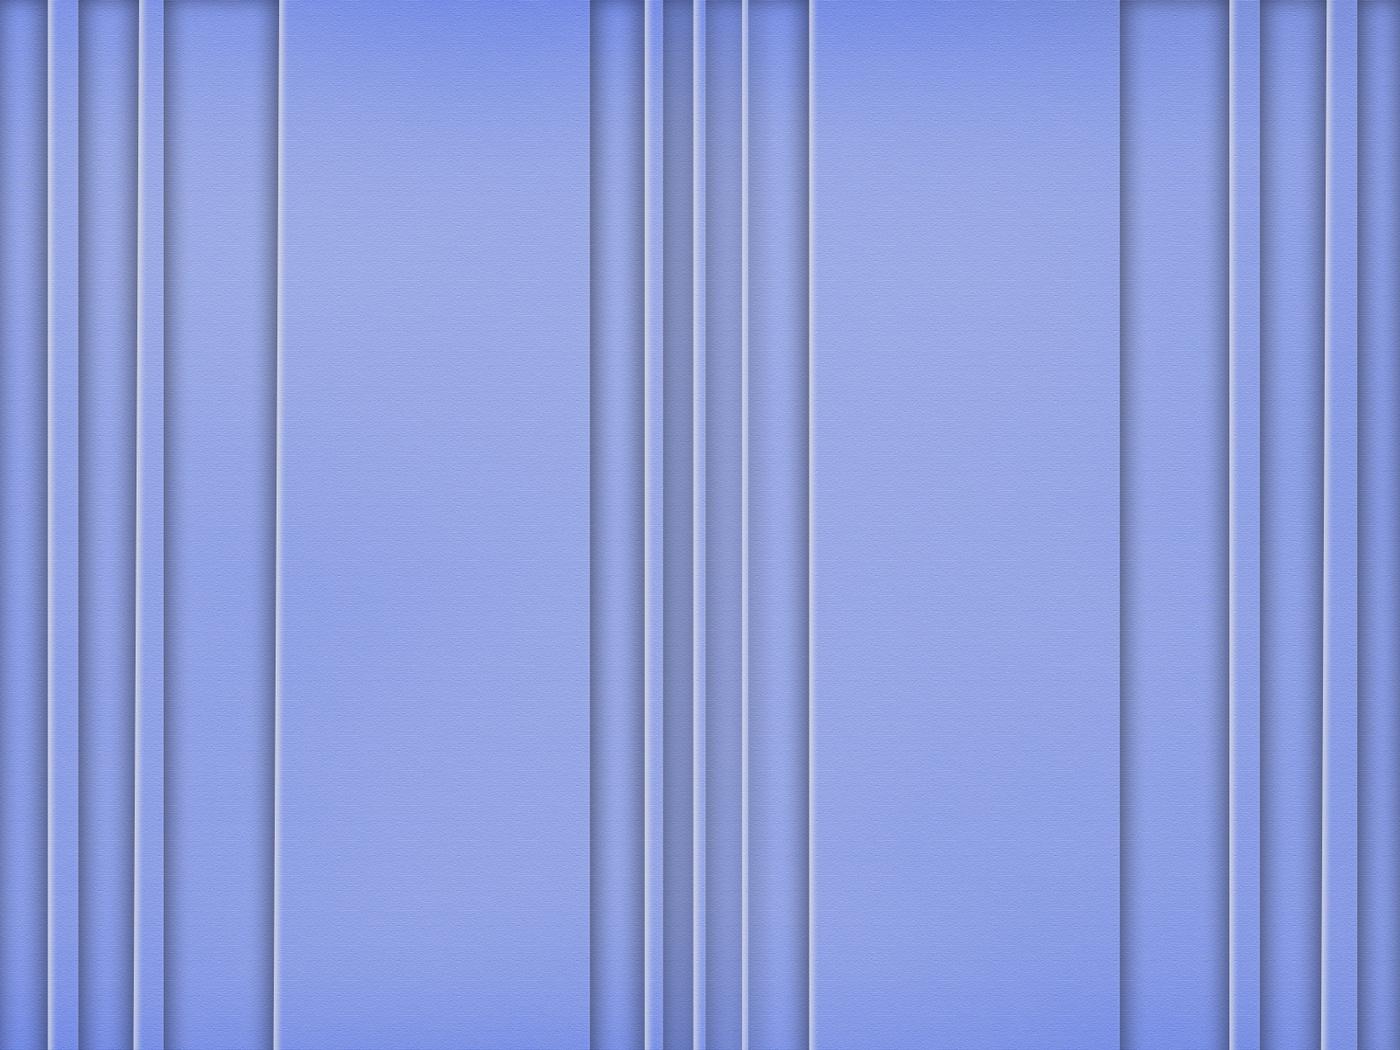 stripes, patterns, lines, 1920x1200, texture, Текстура, узоры, полосы, линий